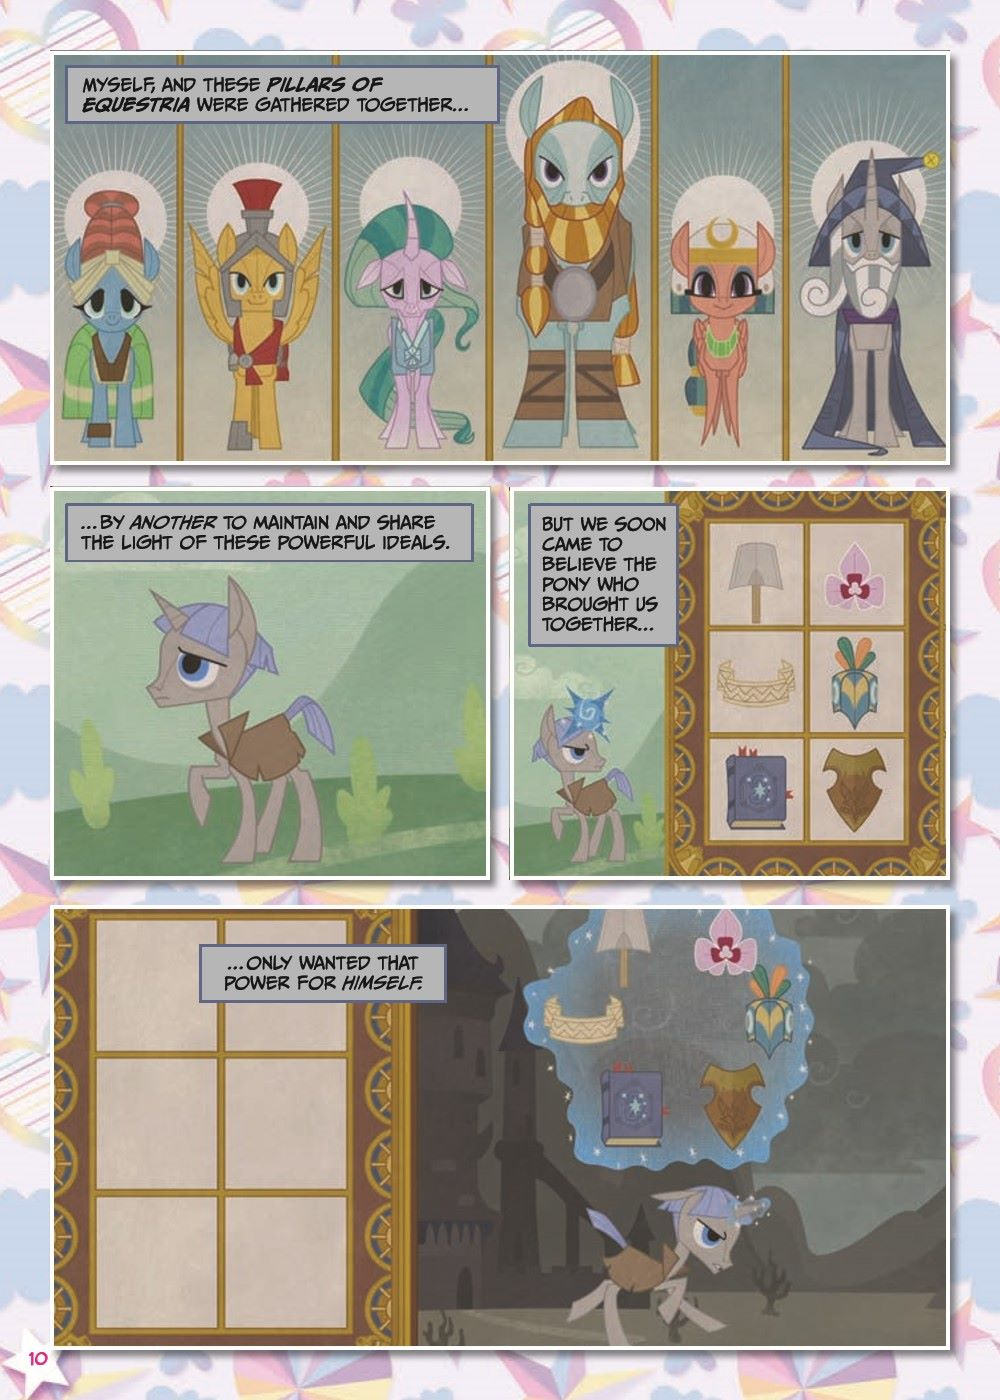 mlp-animatedV14-pr-5 ComicList Previews: MY LITTLE PONY VOLUME 14 SHADOWPLAY TP